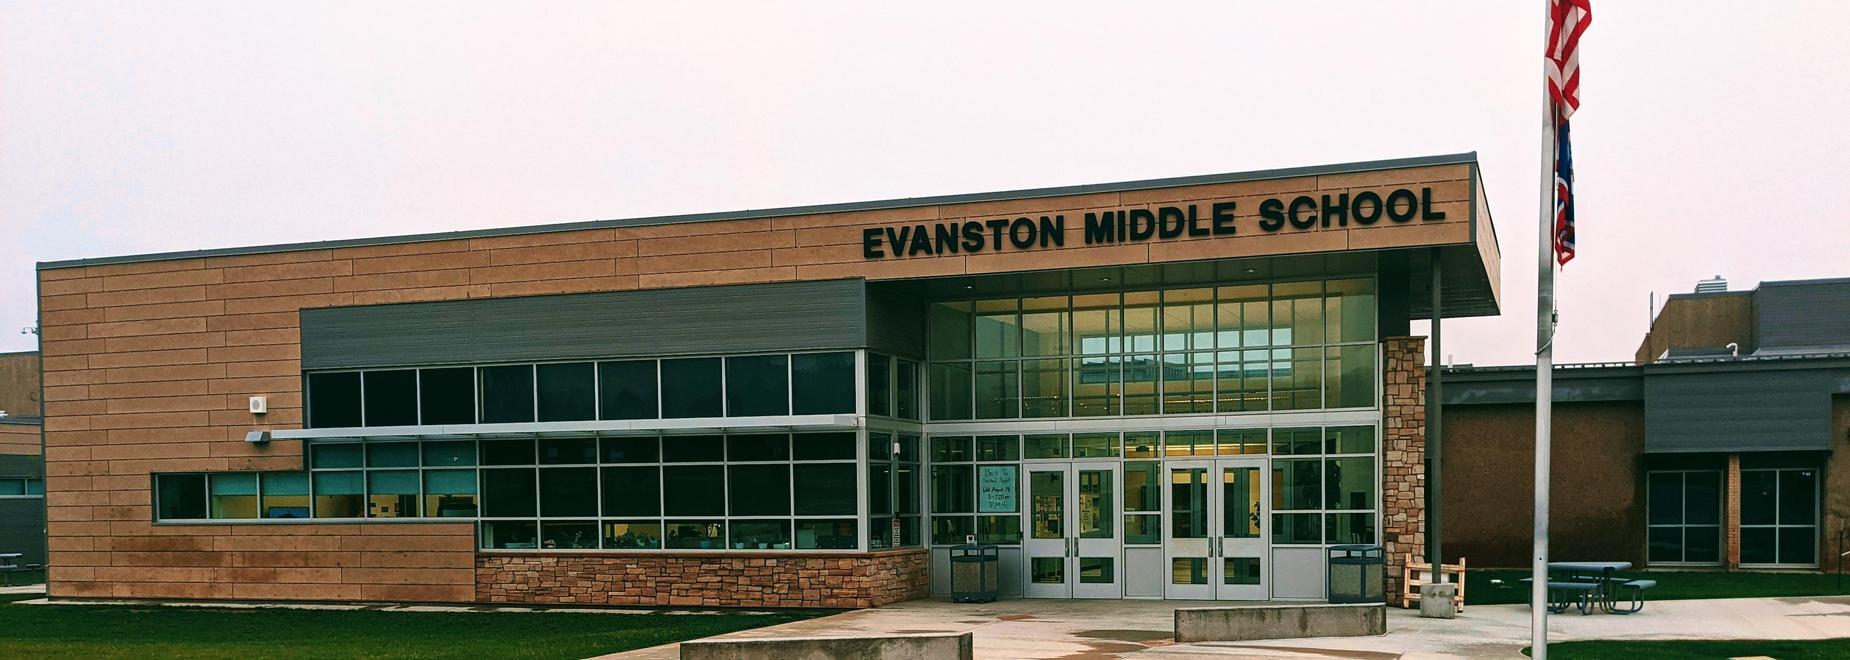 Evanston Middle School